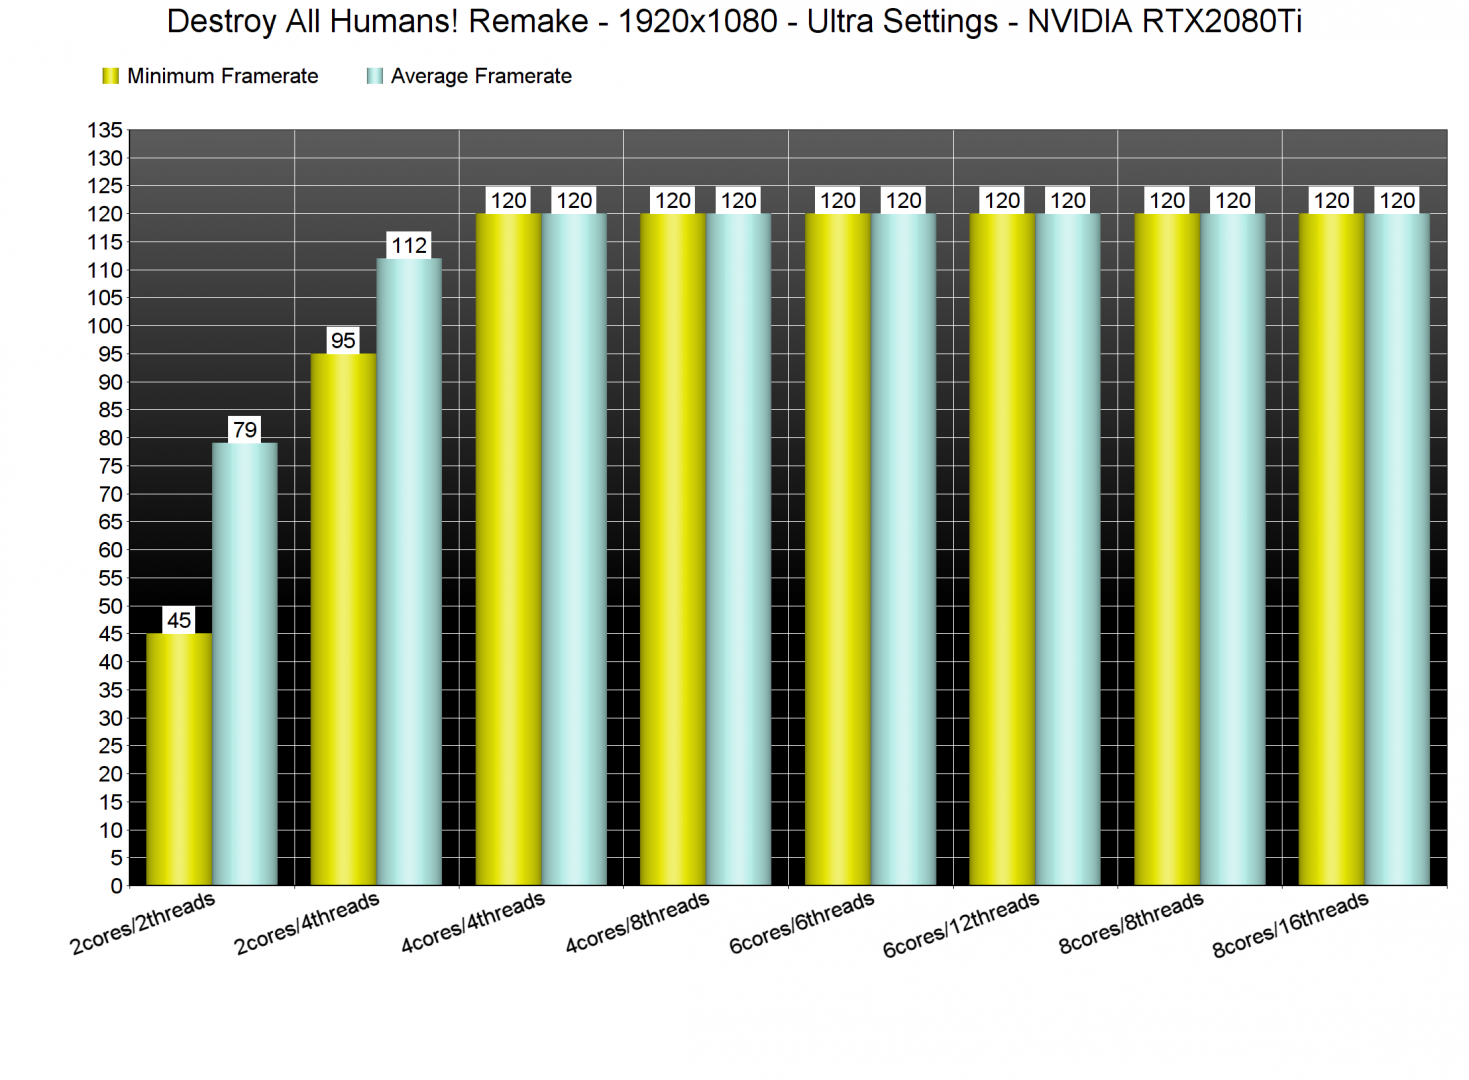 Destroy All Humans! Remake CPU benchmarks